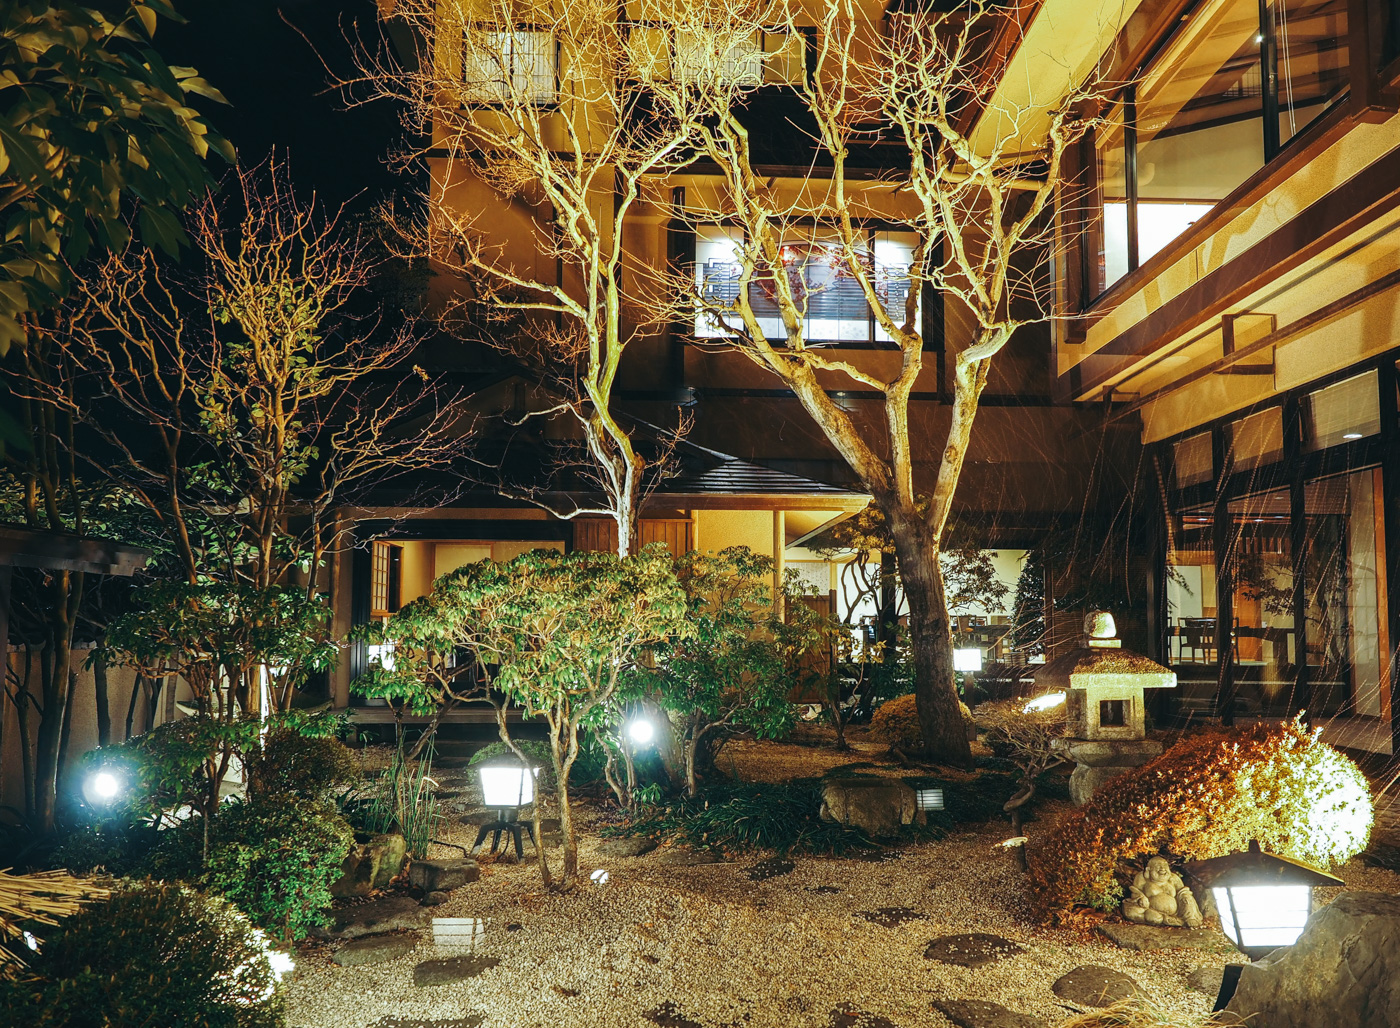 Japan - Mount Fuji - Kozanteiubuya Ubuya Hotel garden area